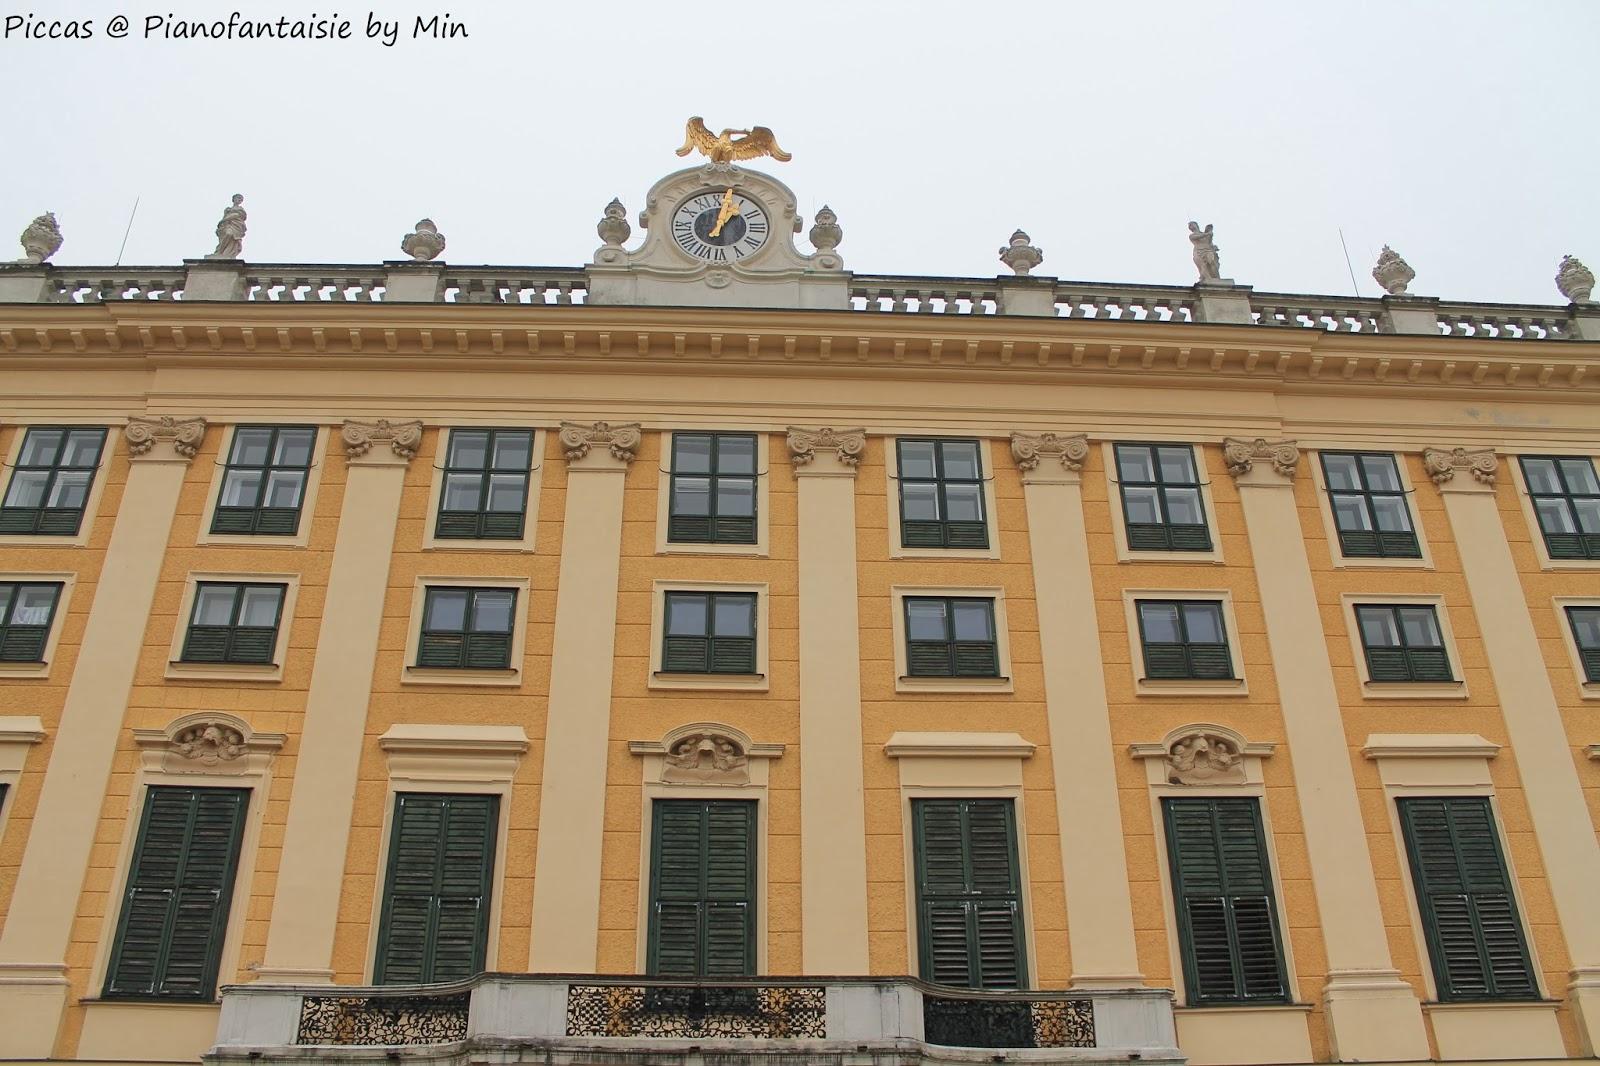 piccas@pianofantaisie by Min: Vienna Part 5: Schloss Schonbrunn